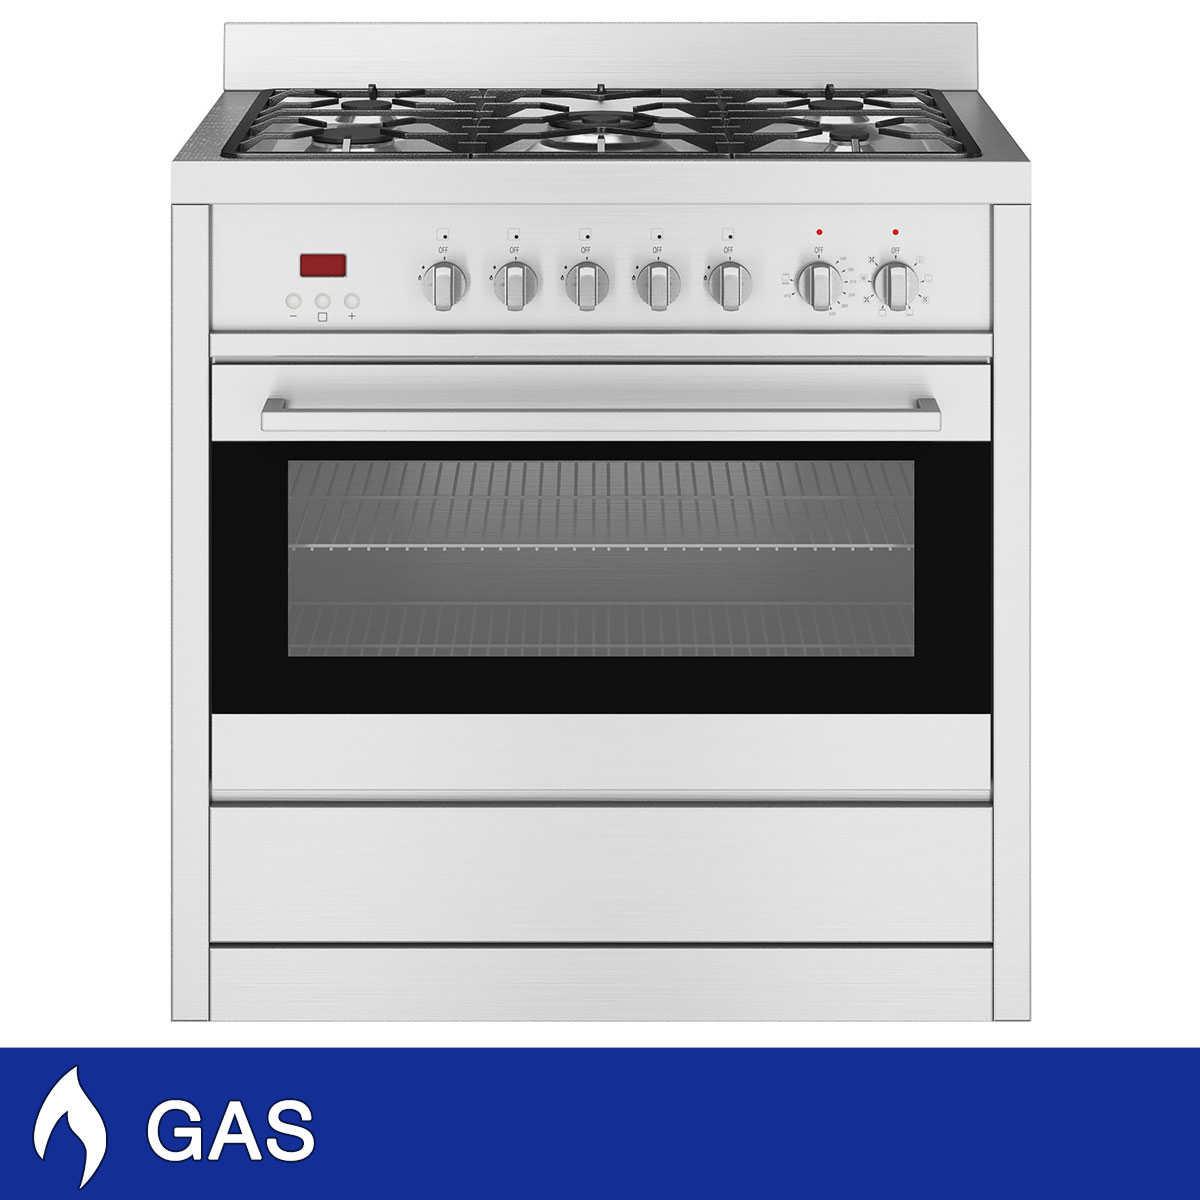 Gas Kitchen Ranges Gas Ranges Costco